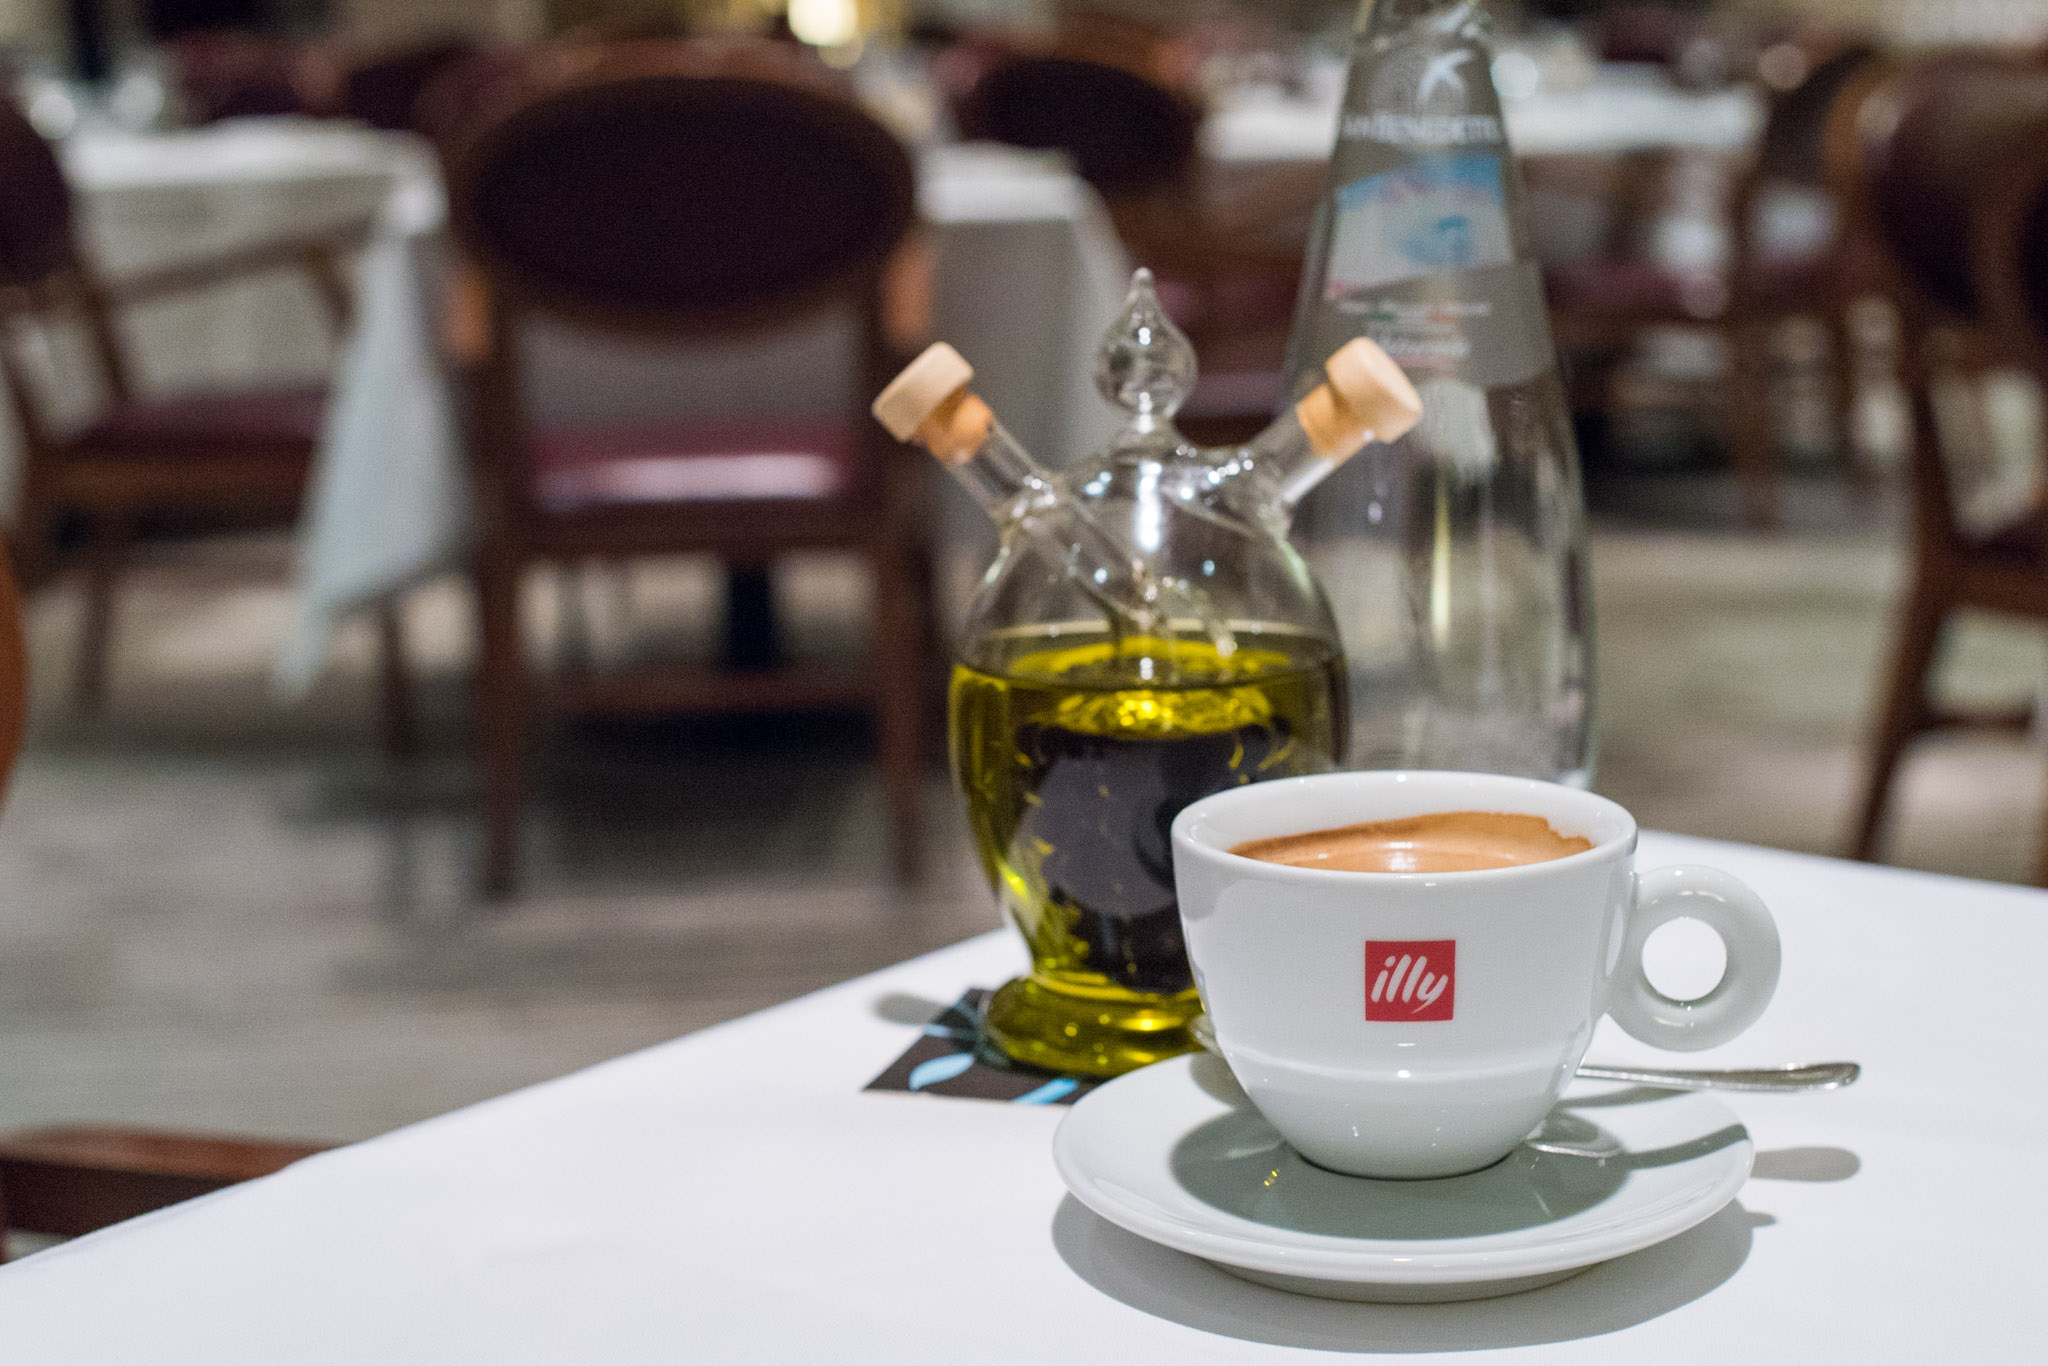 Coffee  DOMVS, The Italian Restaurant - Sheraton Towers Singapore